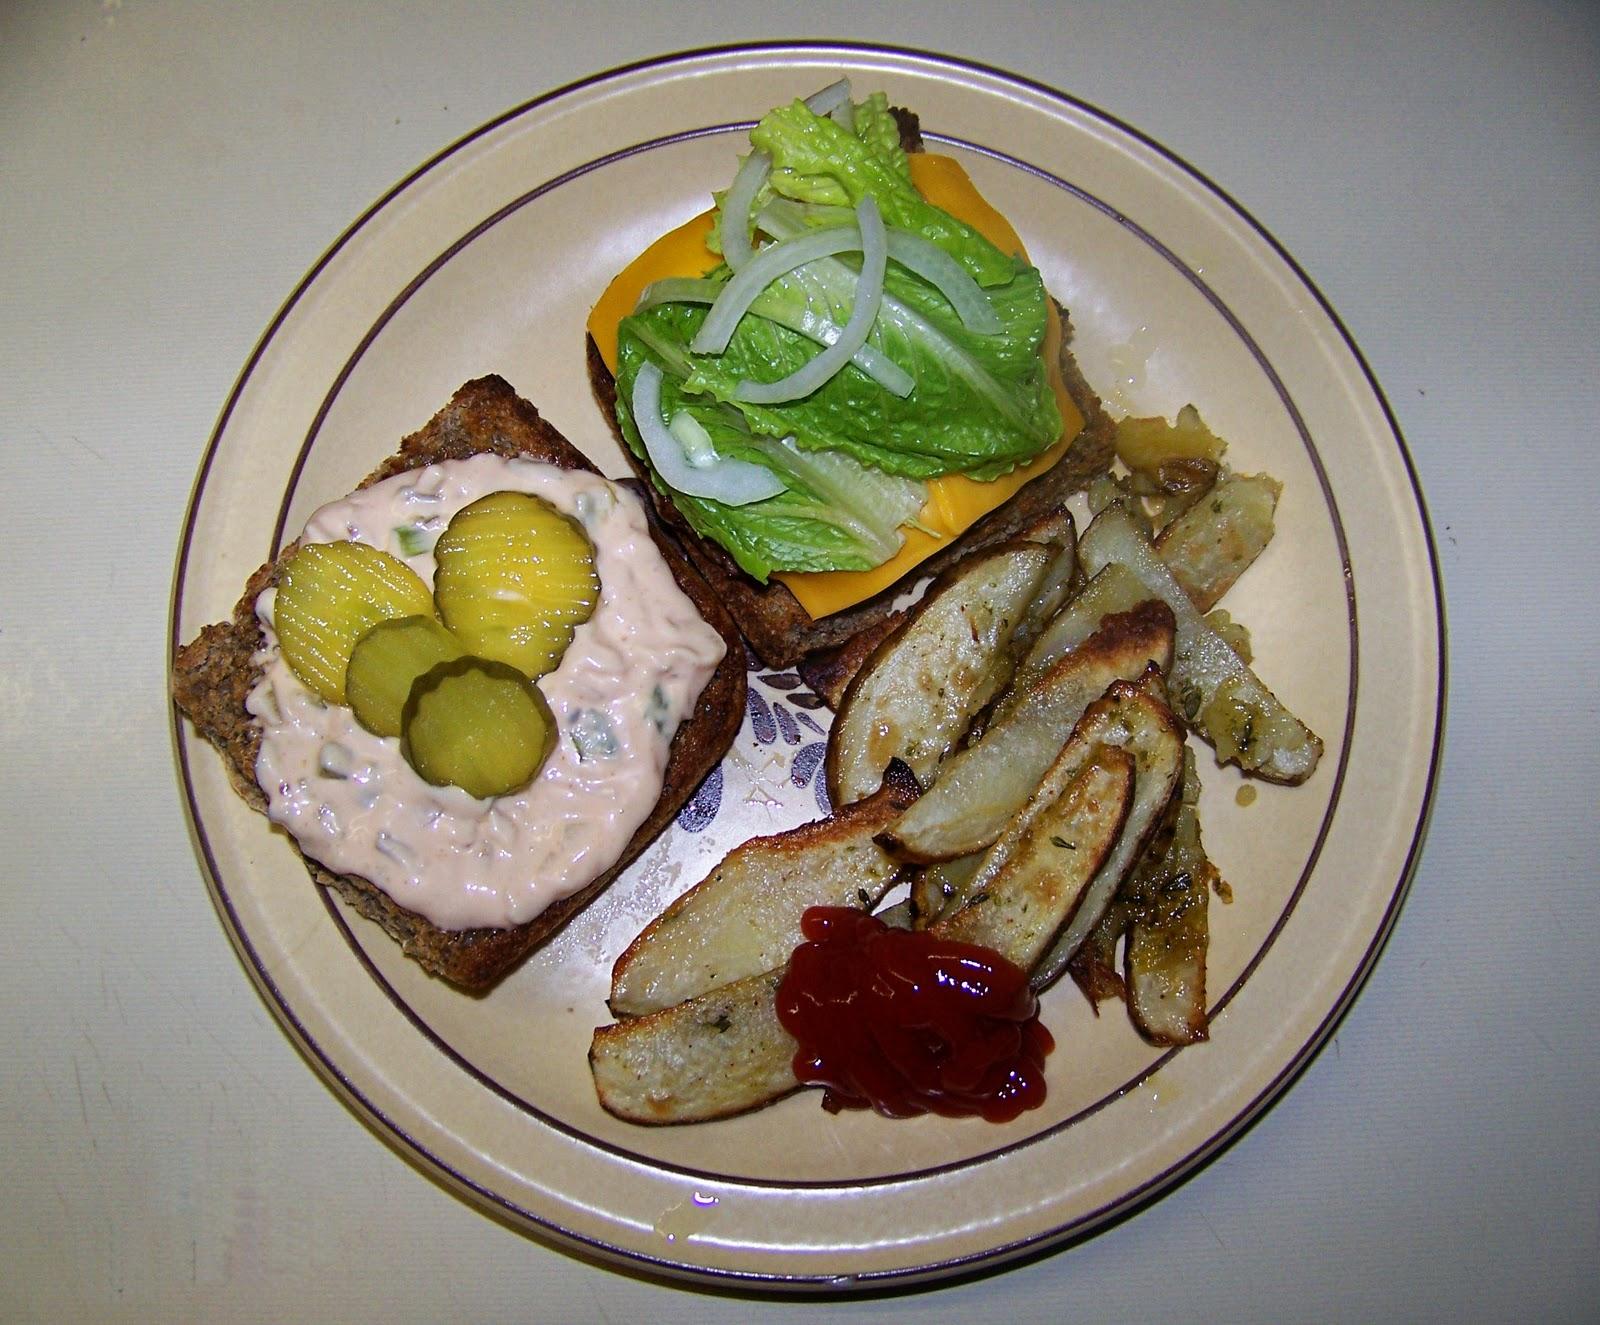 Big Mac vs Big King - Which is Burger is Better: McDonald's Big Mac or ...